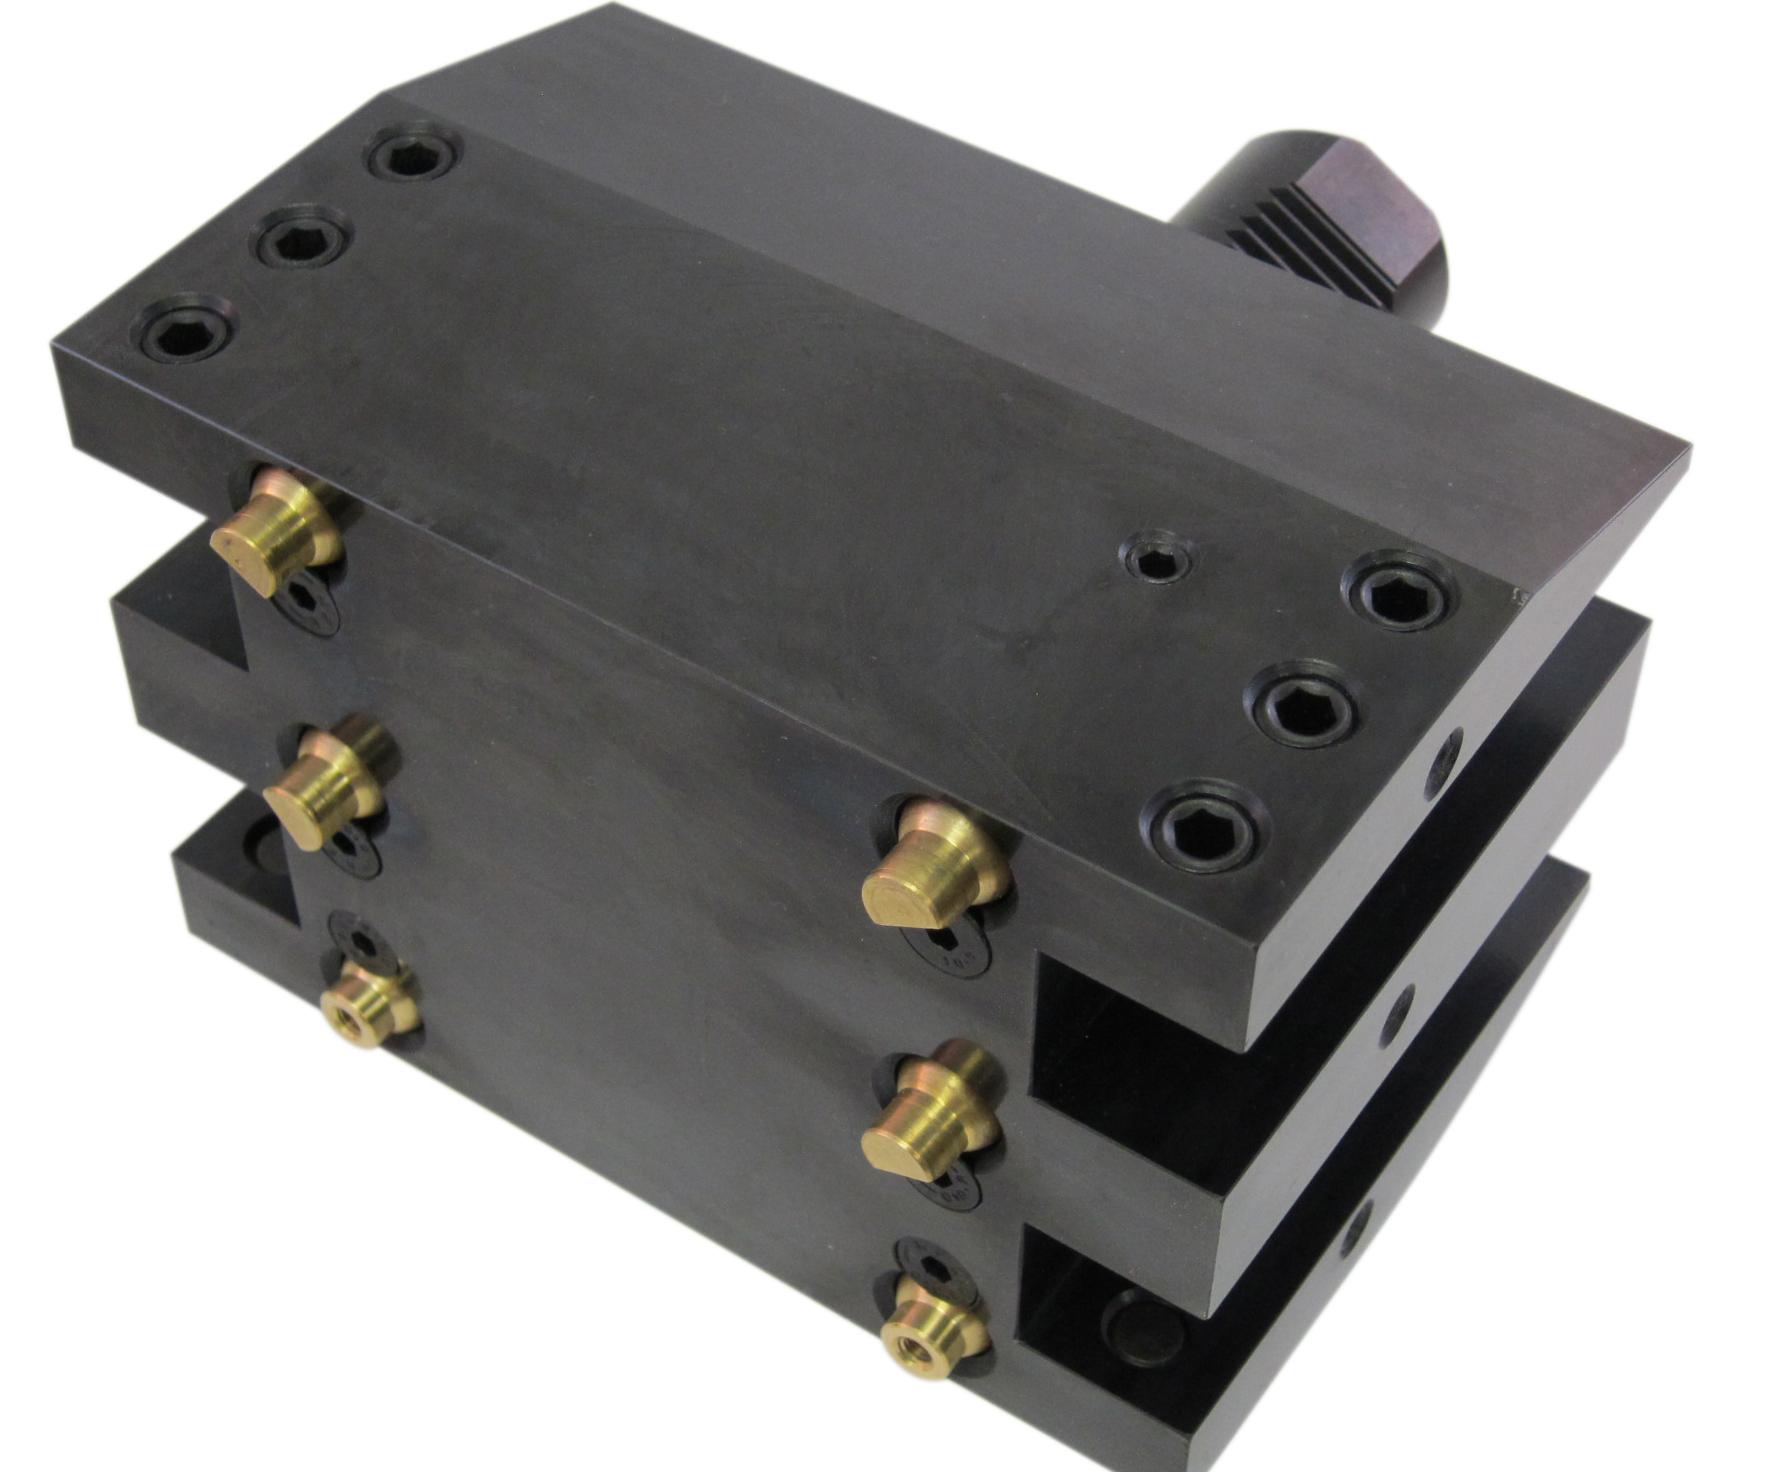 Exsys Tool Inc. quad square shank static toolholder